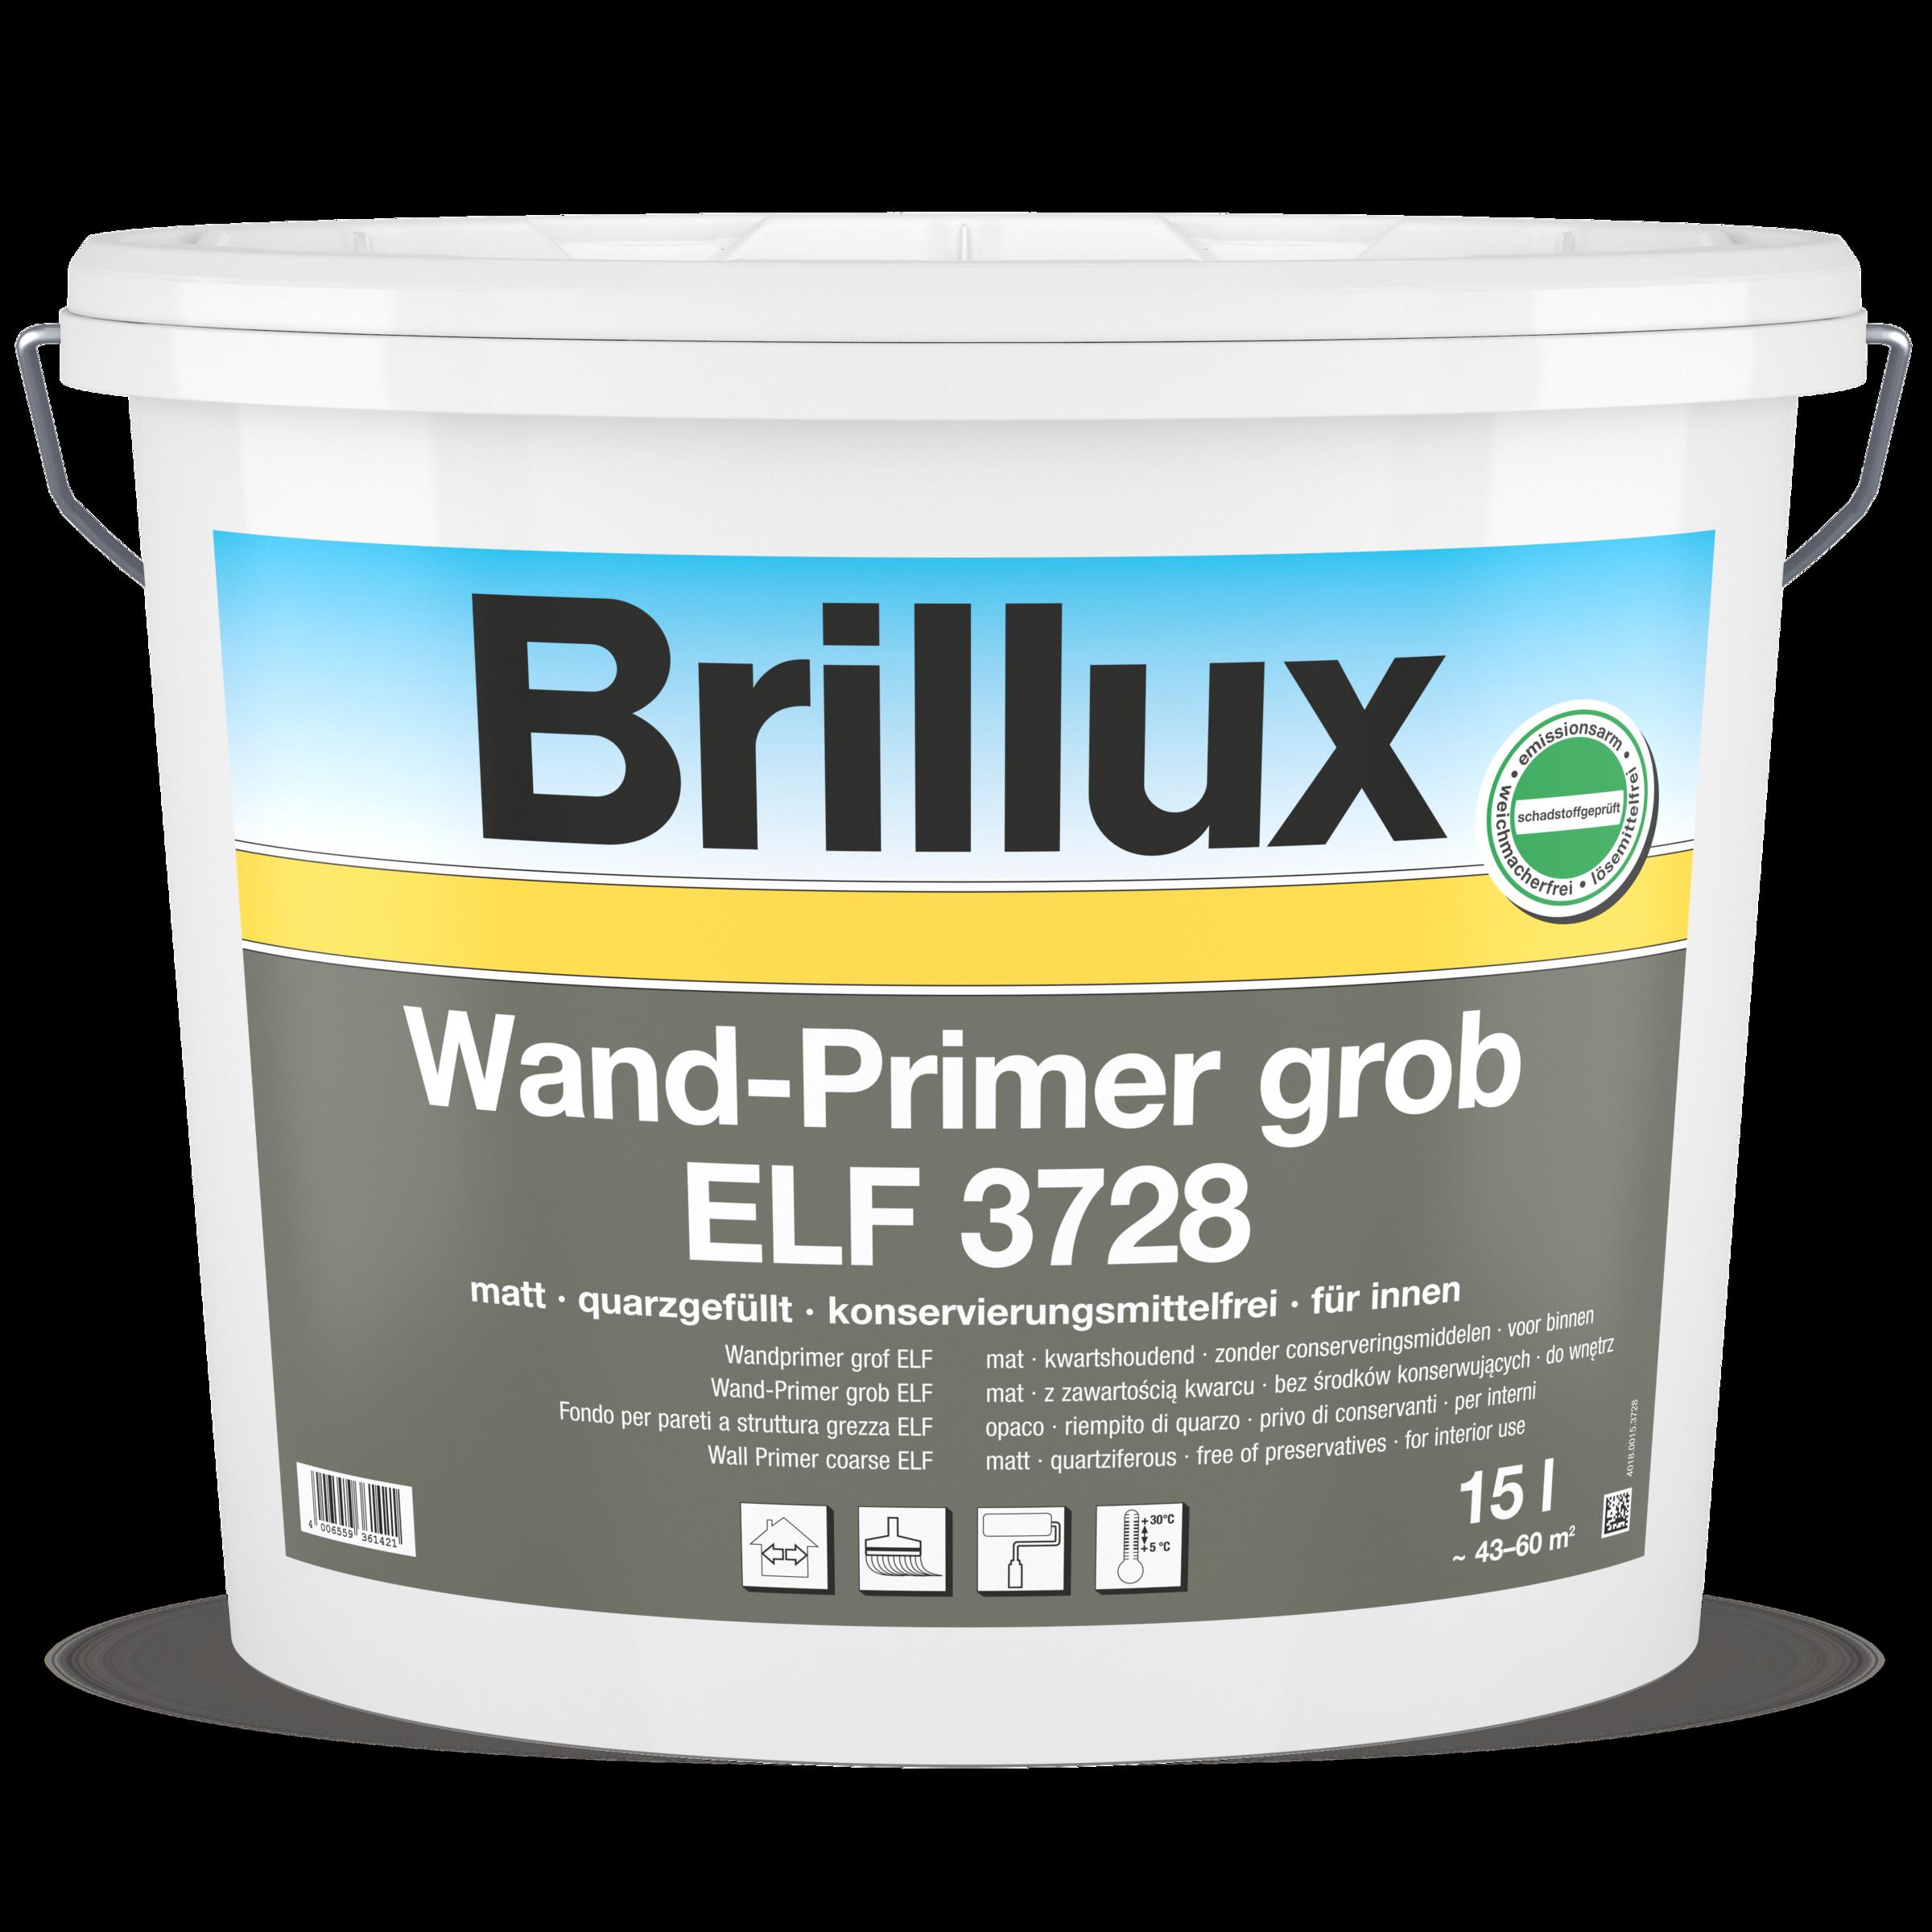 Wand-Primer grob ELF 3728